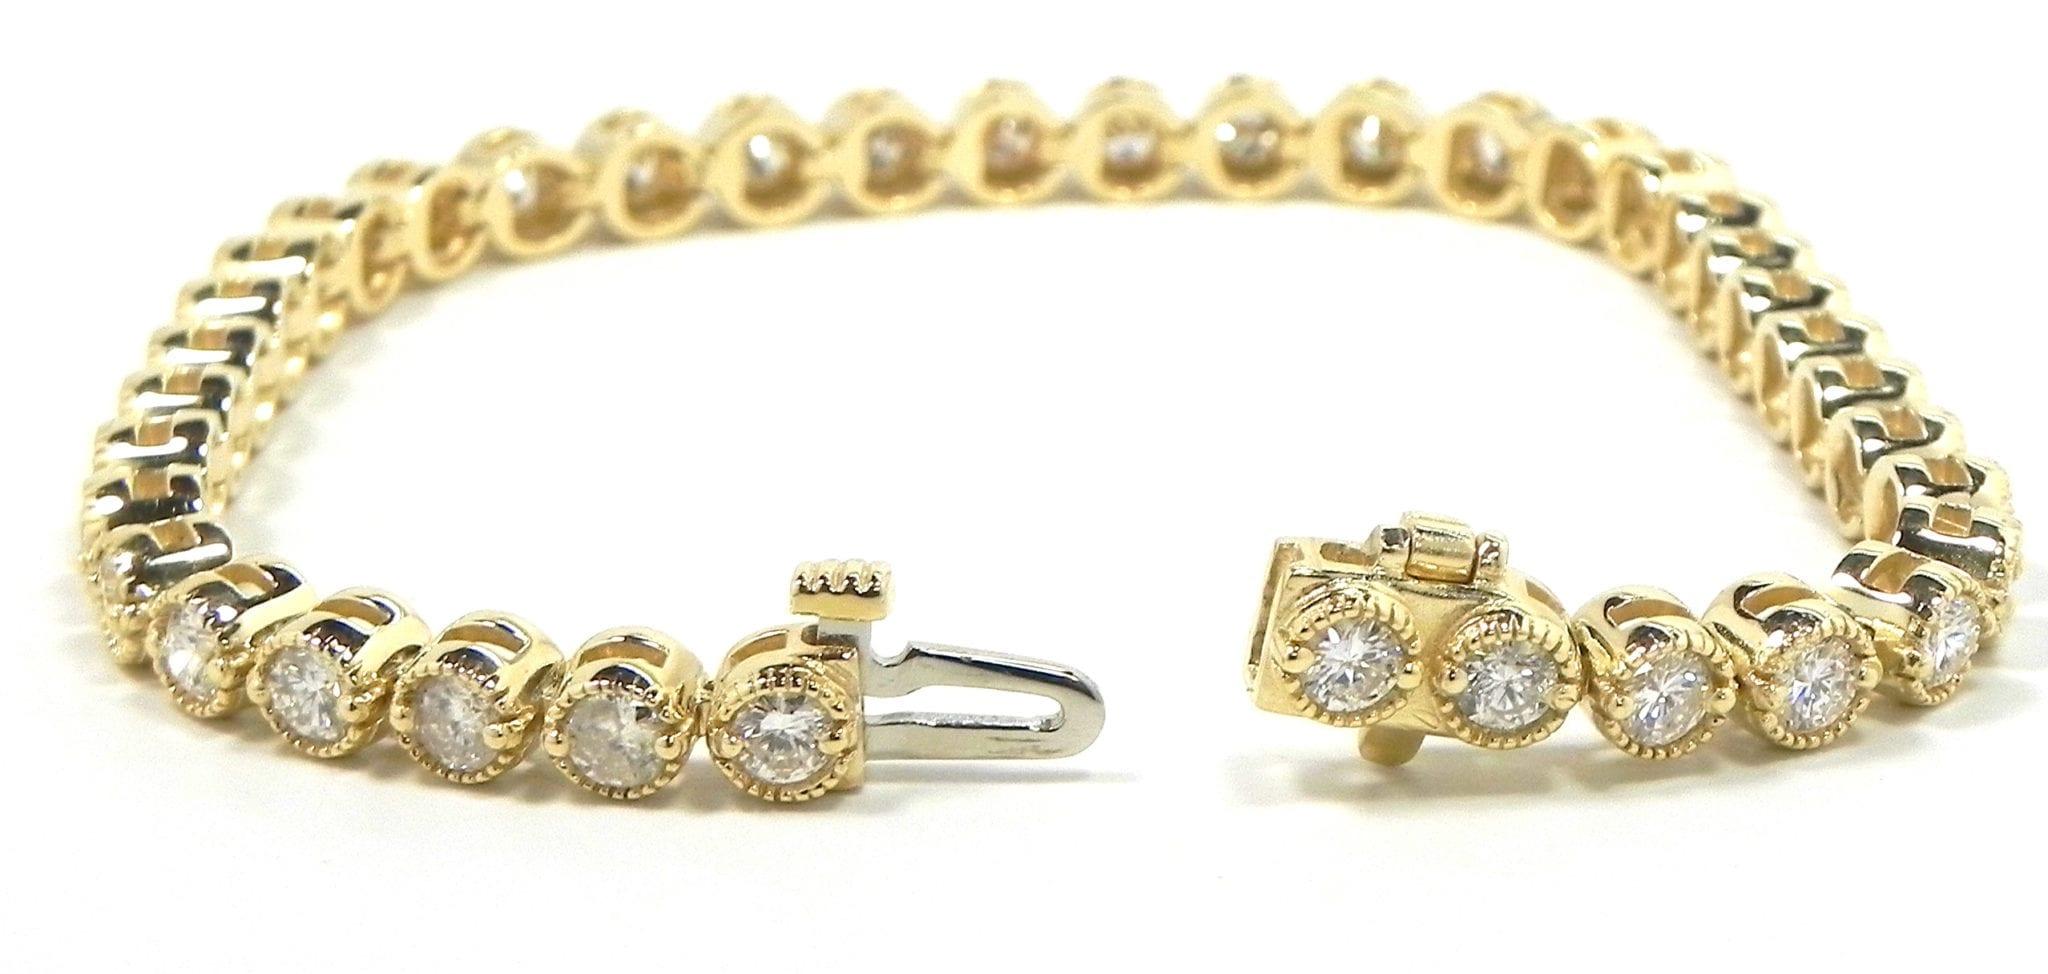 Ladies 14k Yellow Gold 3 80 Cts Diamonds Tennis Bracelet Bright Jewelers Bright Jewelers